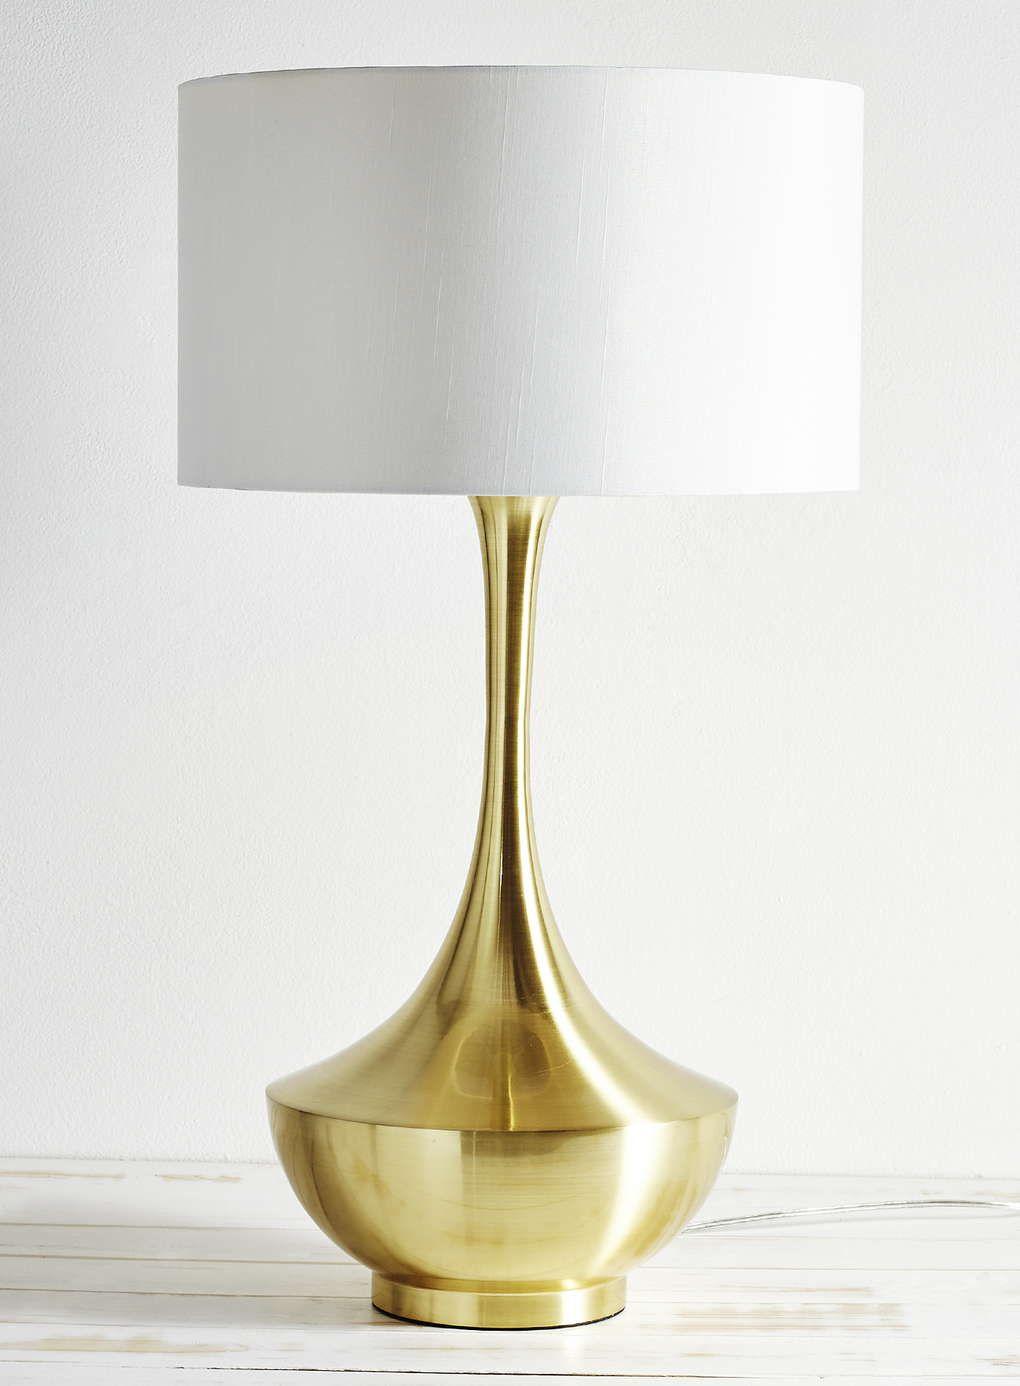 Photo 2 of Brass Brock Table Lamp   Tessa\'s new house   Pinterest ...